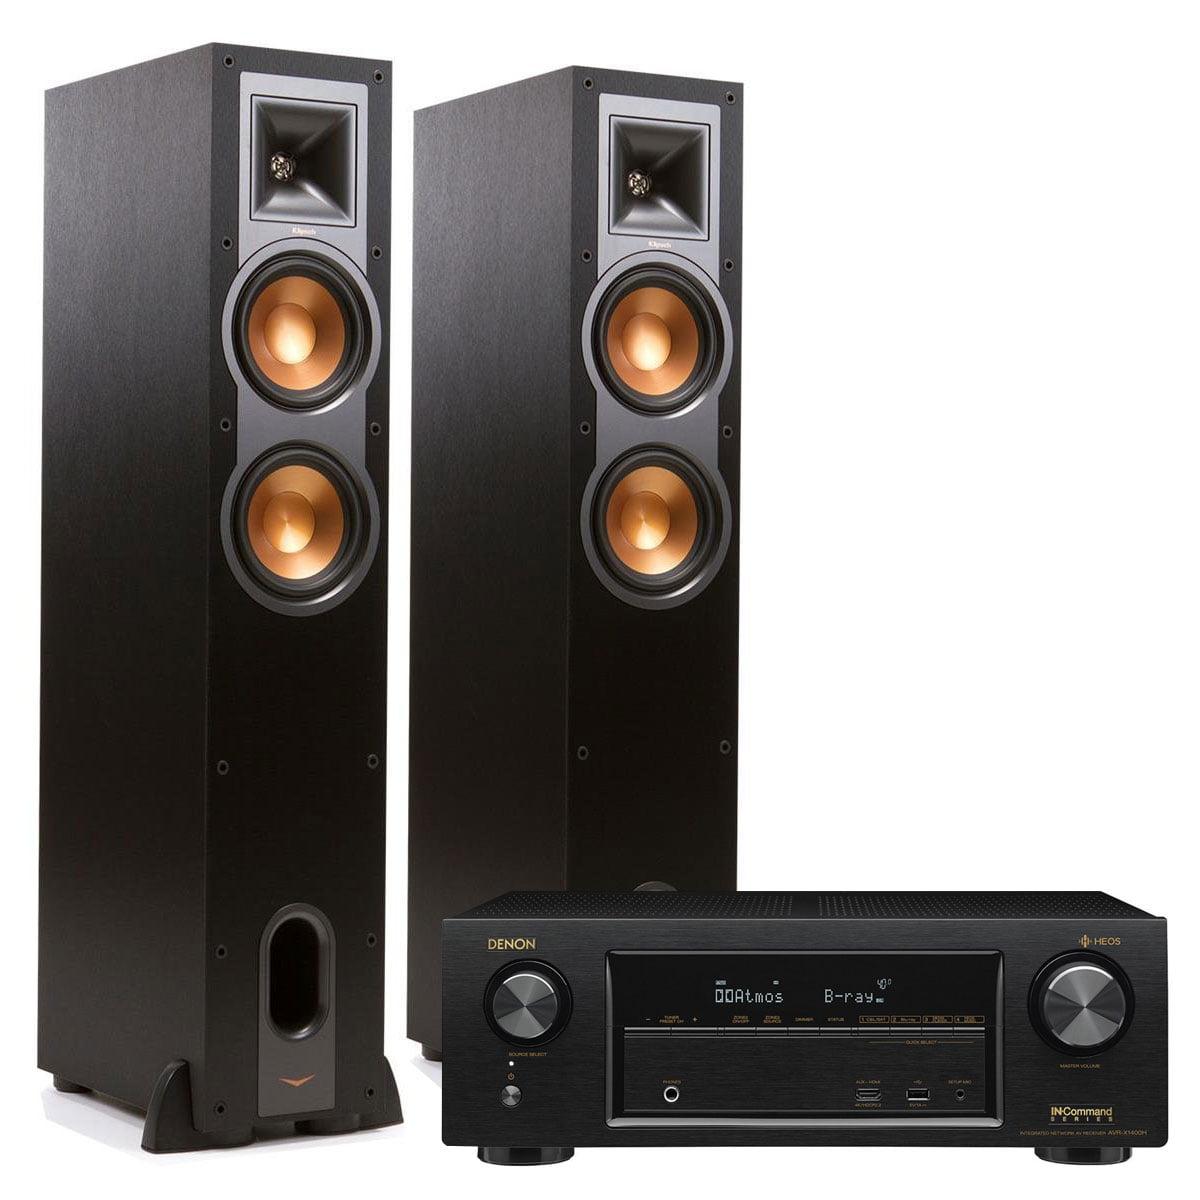 Denon AVR-X1400H 7.2 Channel AV Receiver with HEOS and Klipsch R26F Floorstanding Speakers Pair (Black) by Denon